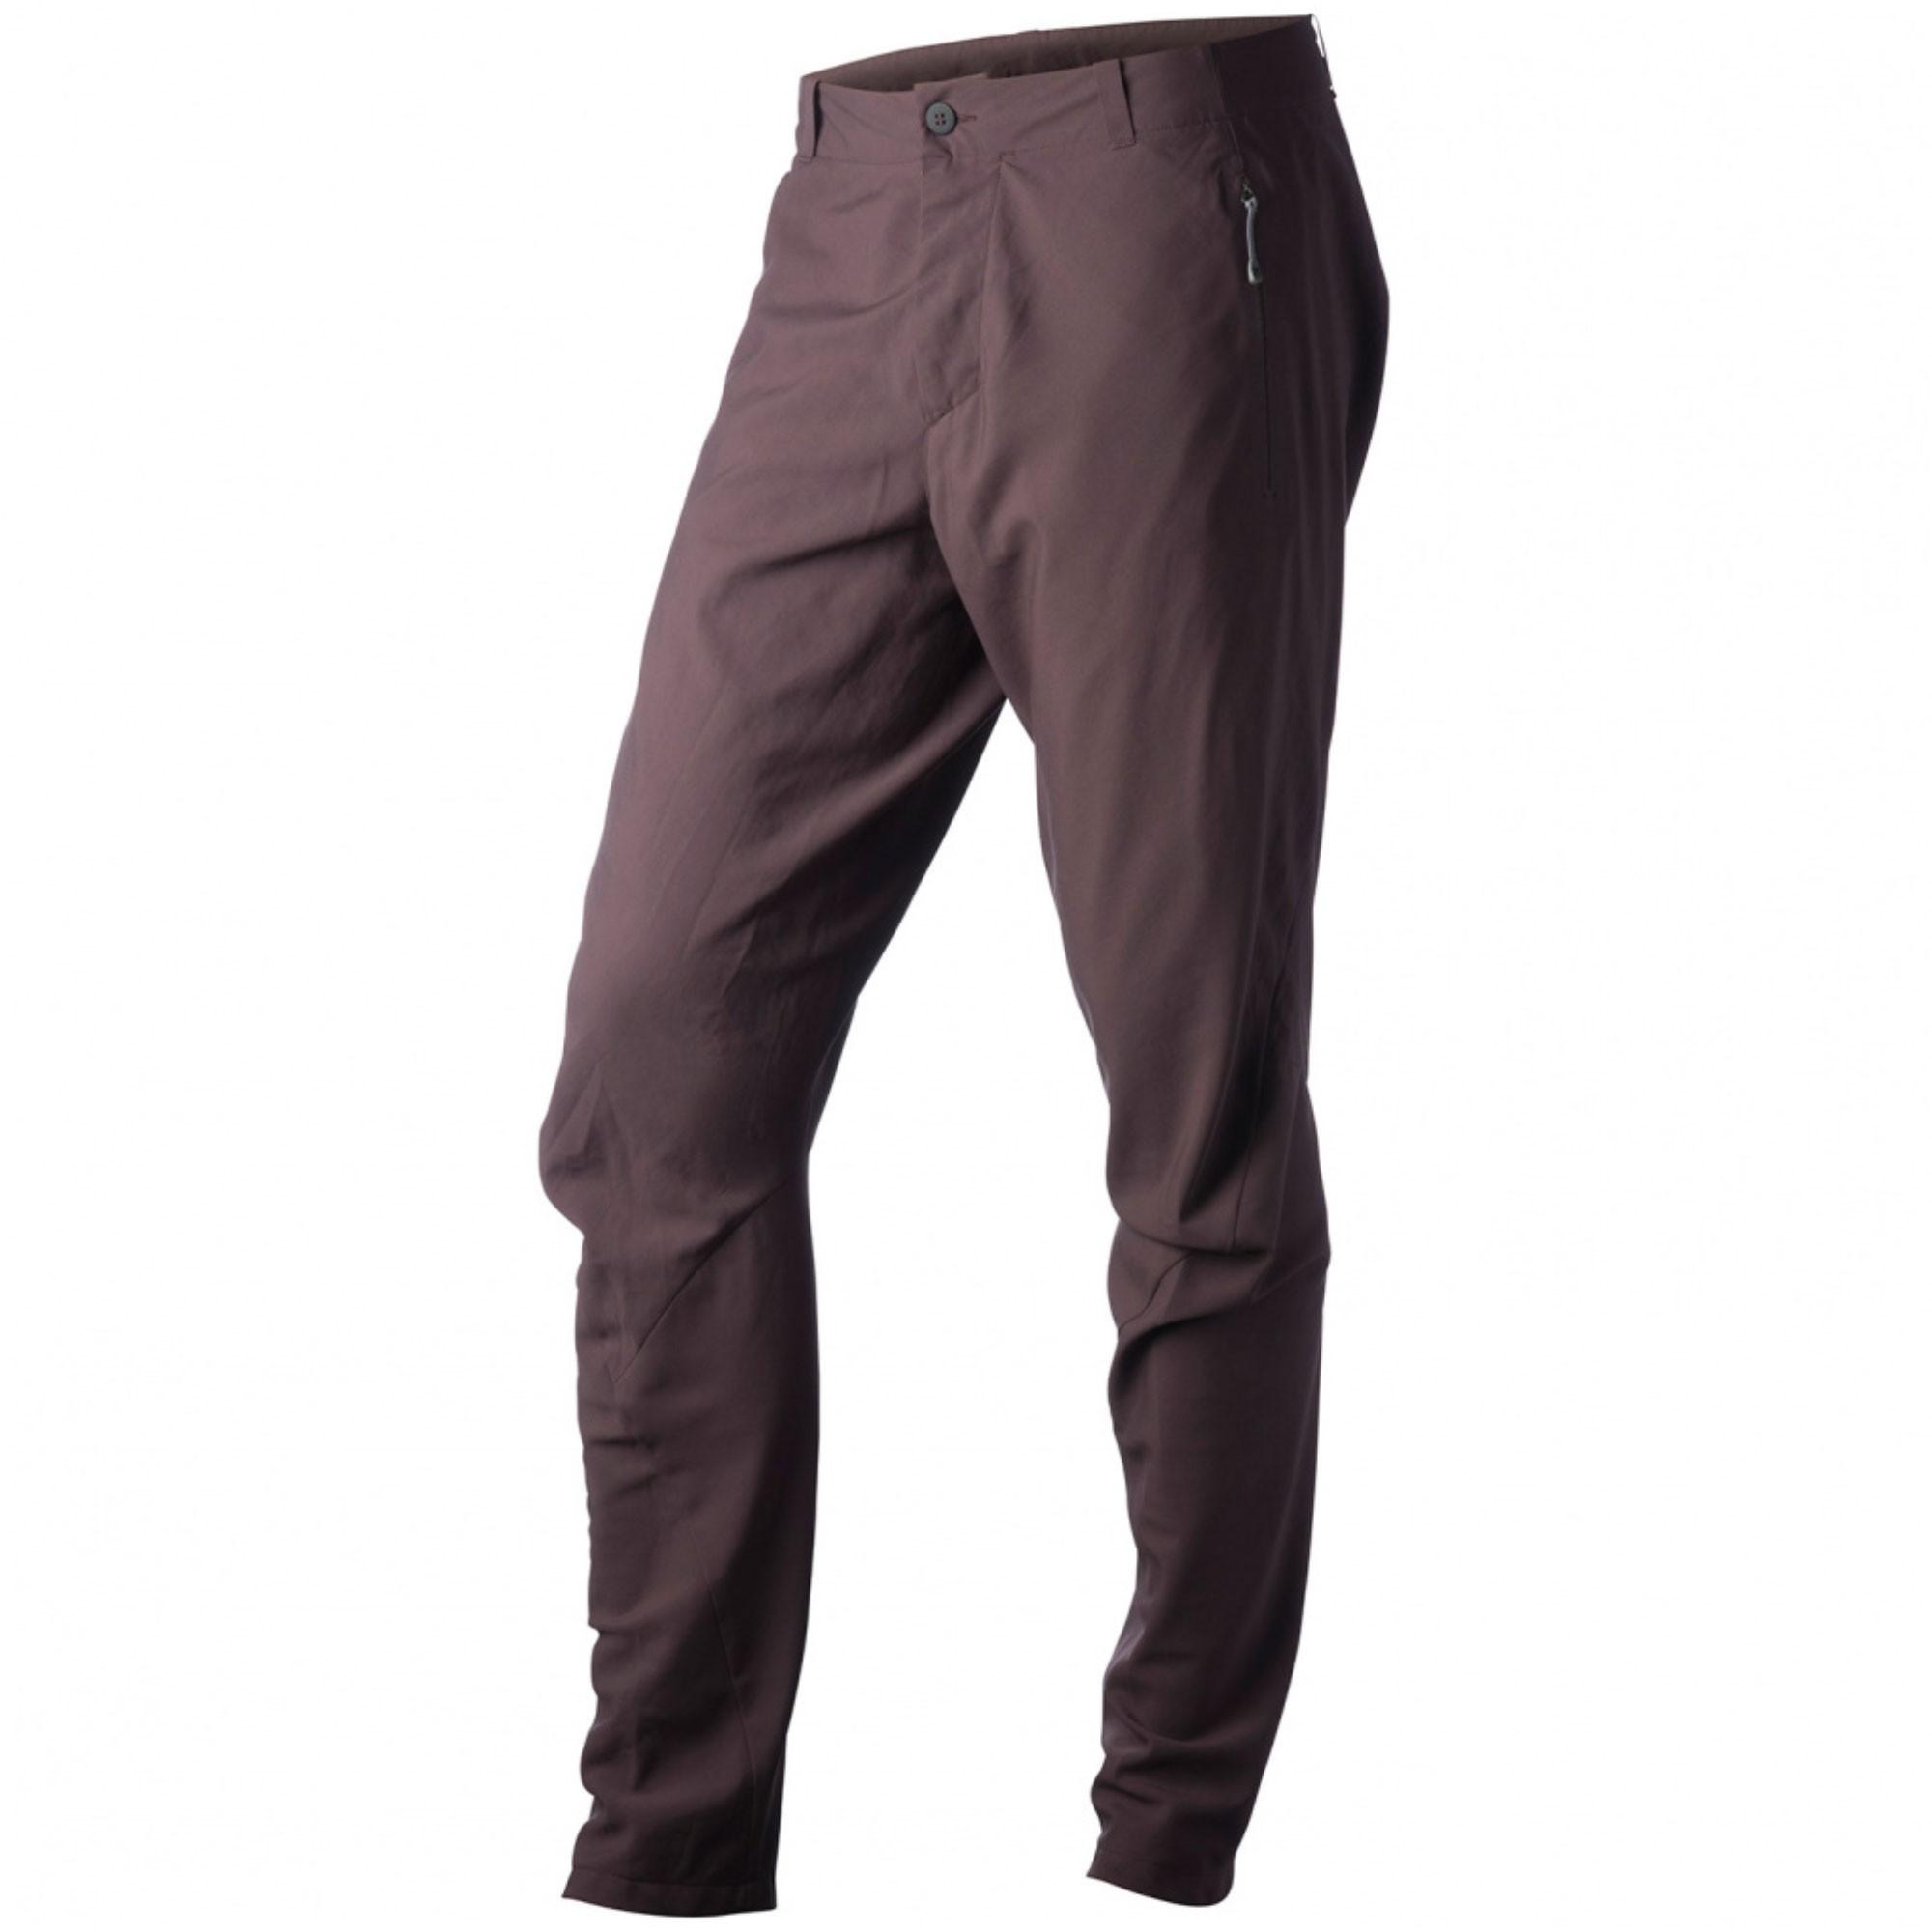 HOUDINI - Motion Light Softshell Pants